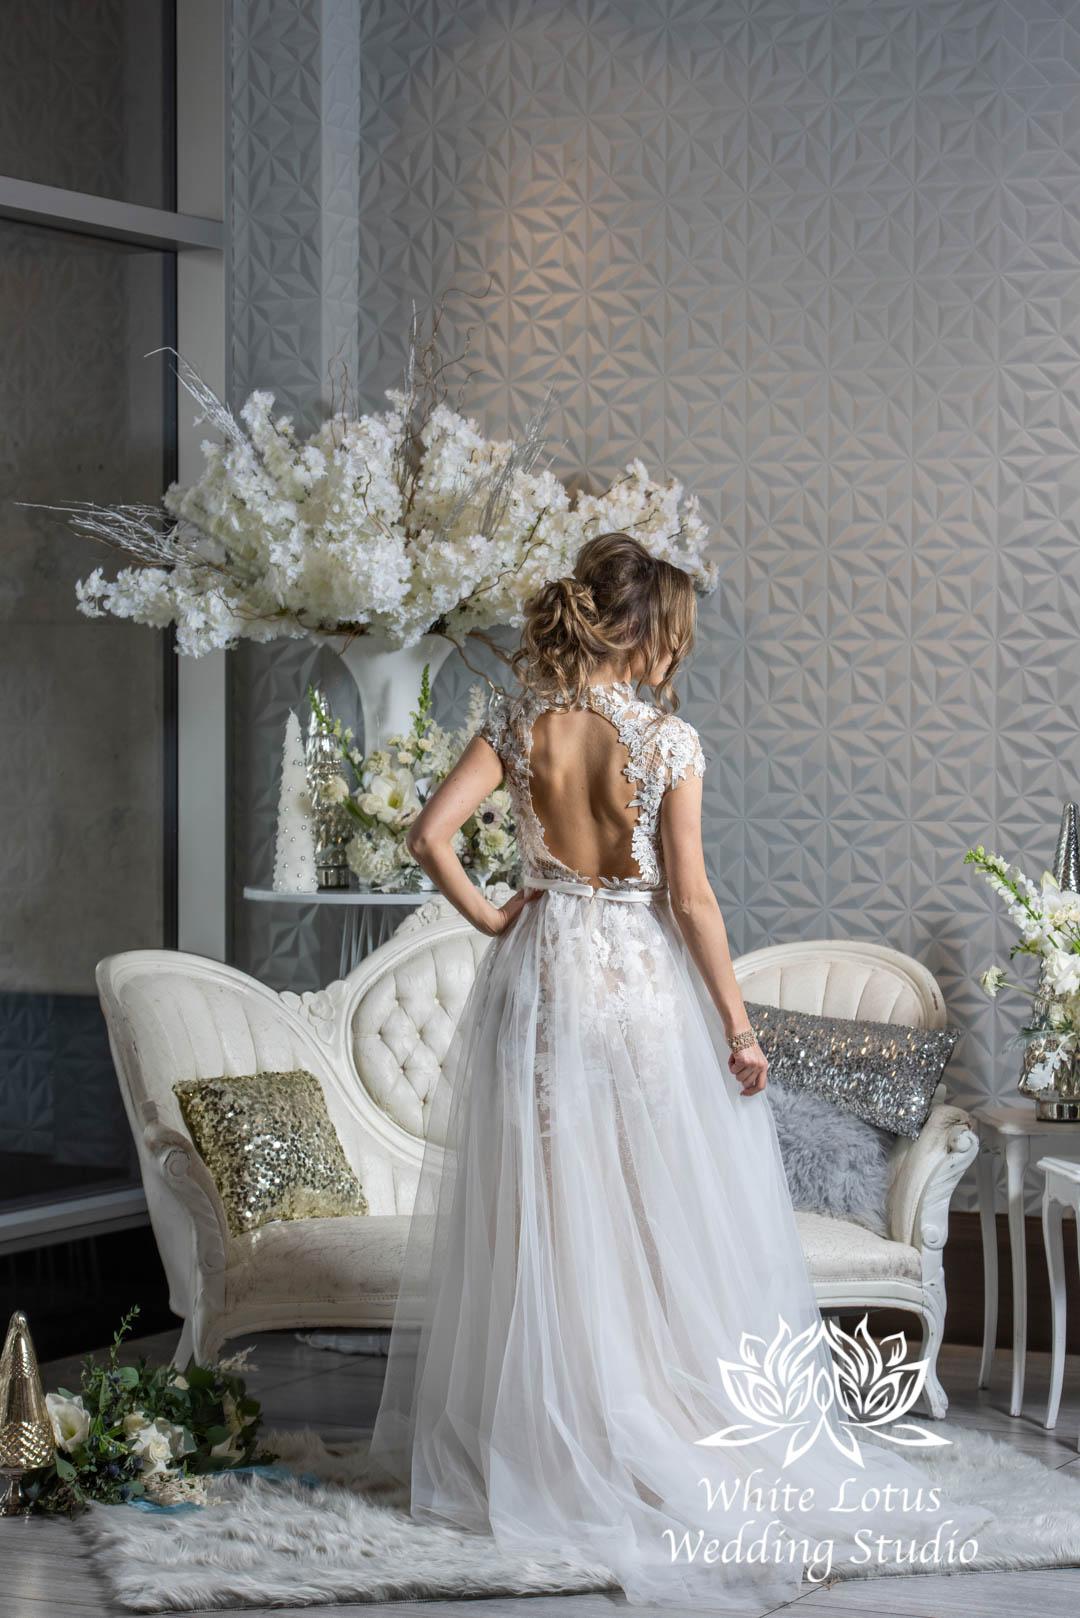 076- GLAM WINTERLUXE WEDDING INSPIRATION